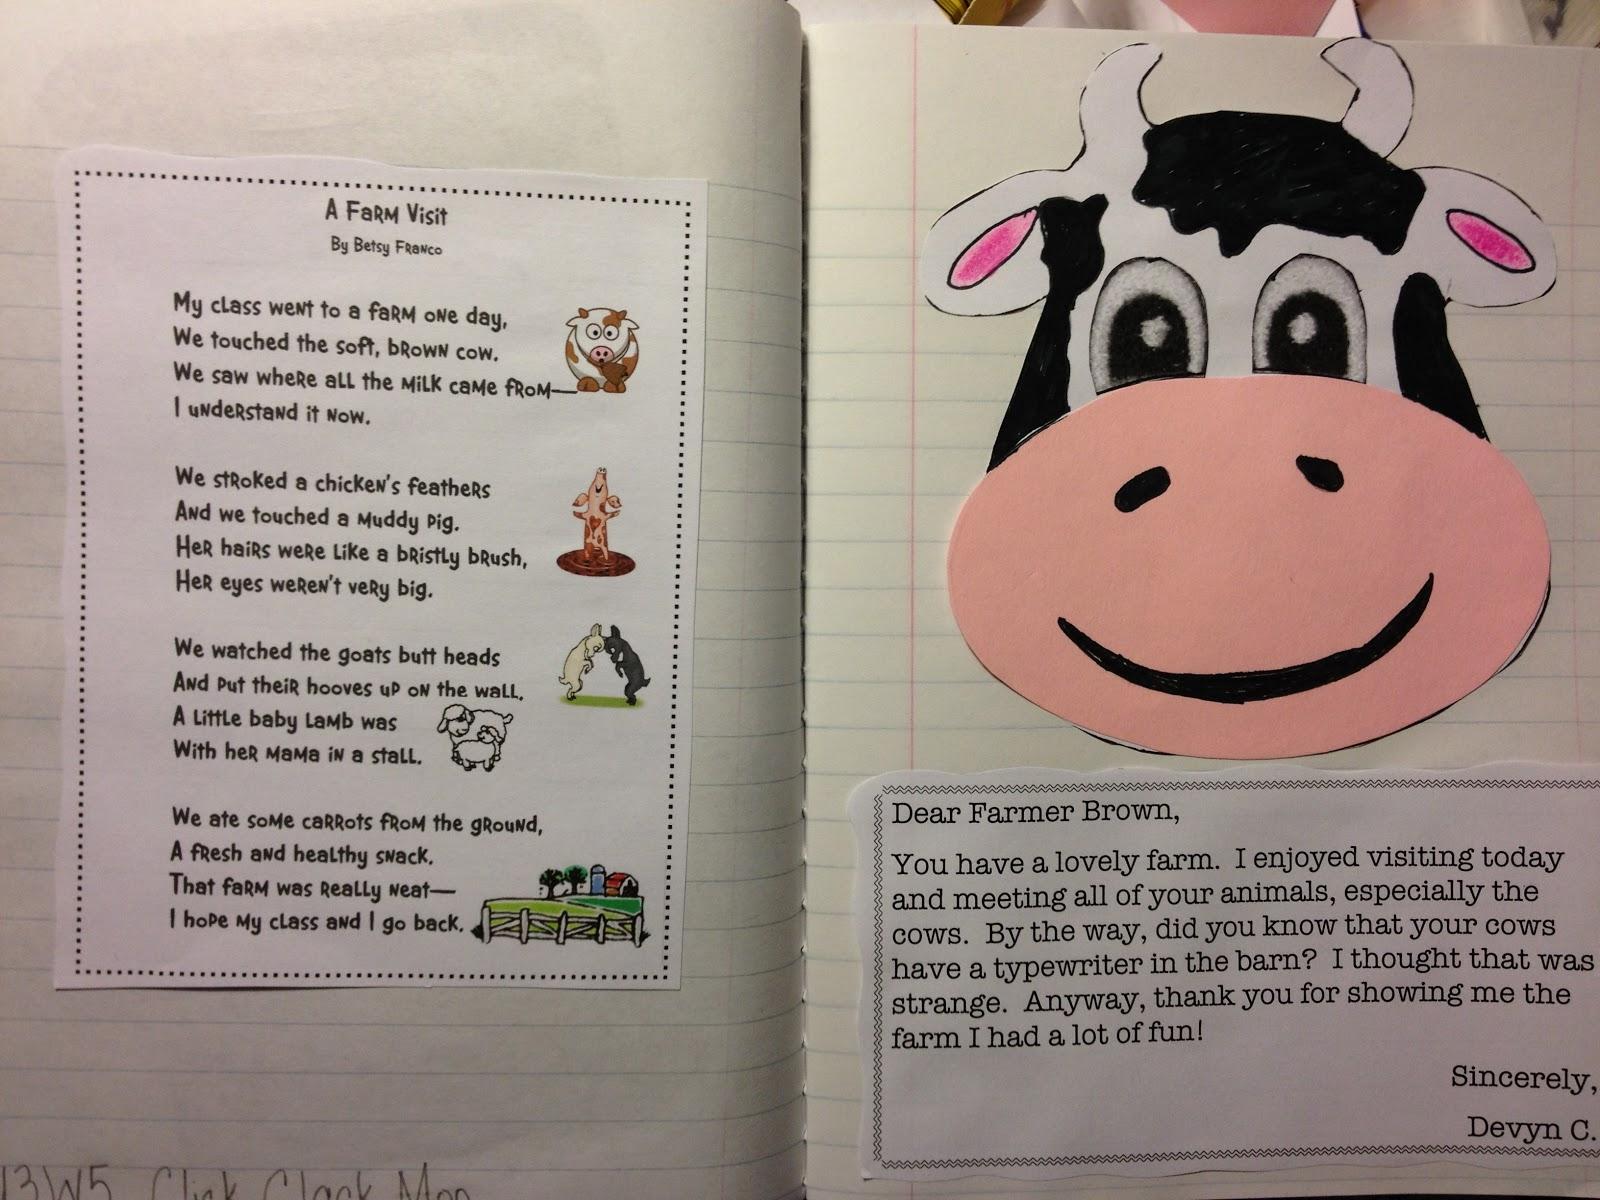 Just 4 teachers sharing across borders u3w5 click clack moo cows